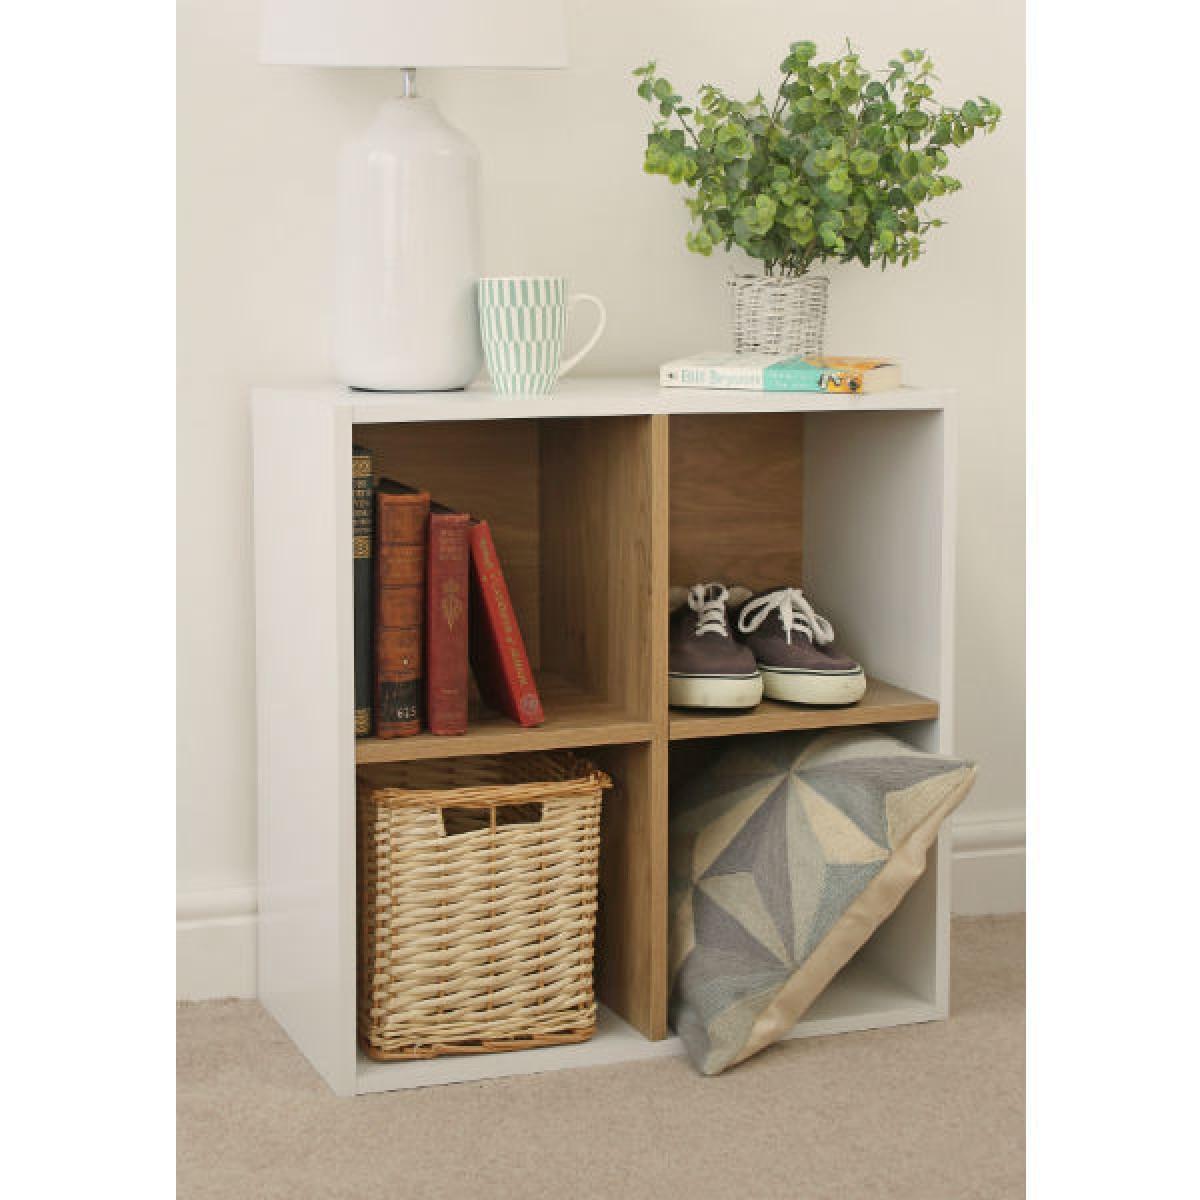 4 cube storage unit. Black Bedroom Furniture Sets. Home Design Ideas